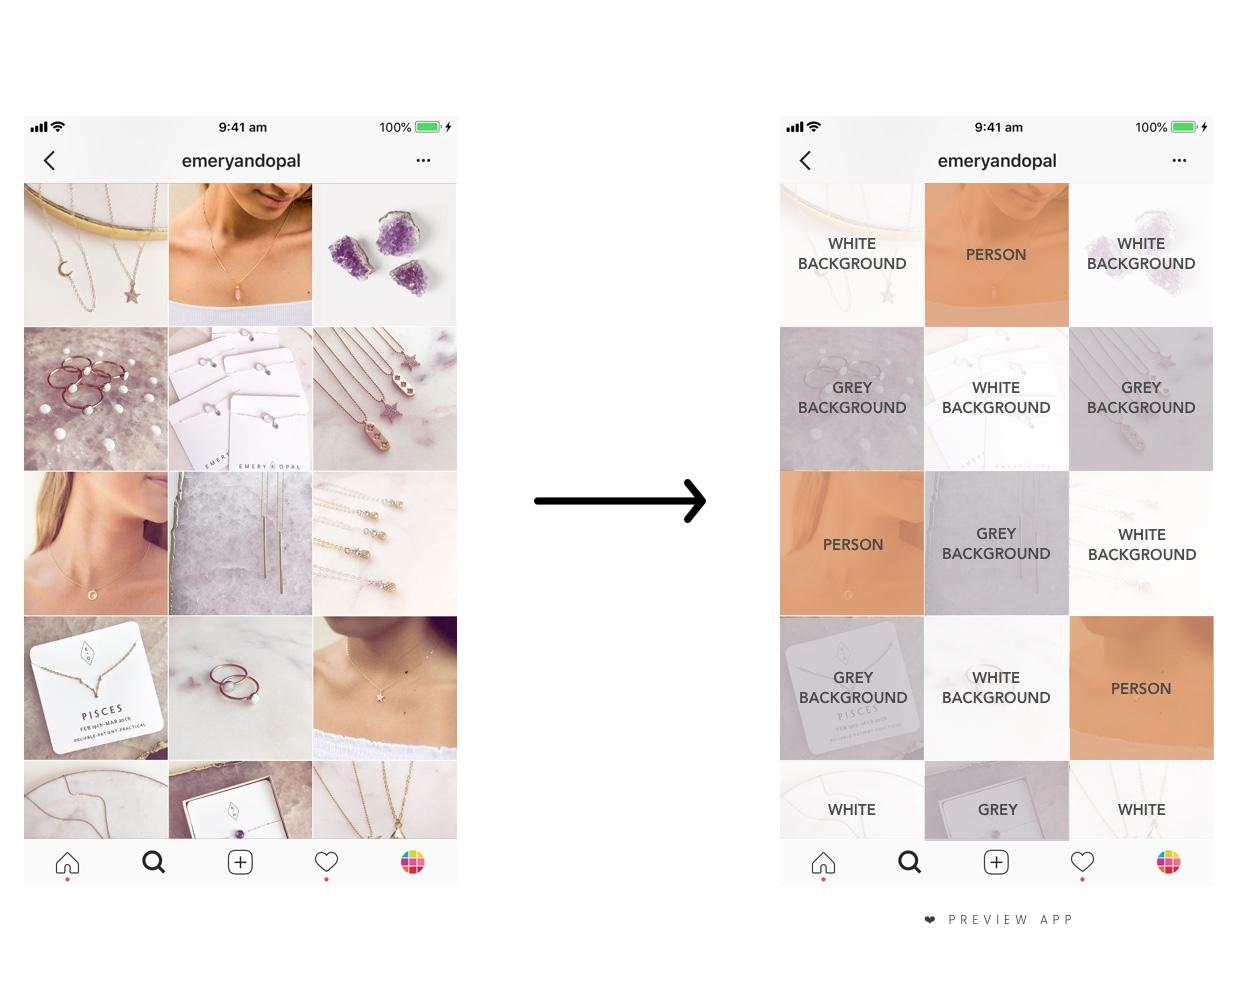 https://thepreviewapp.com/wp-content/uploads/2017/03/improve-instagram-feed-tips-10.jpg